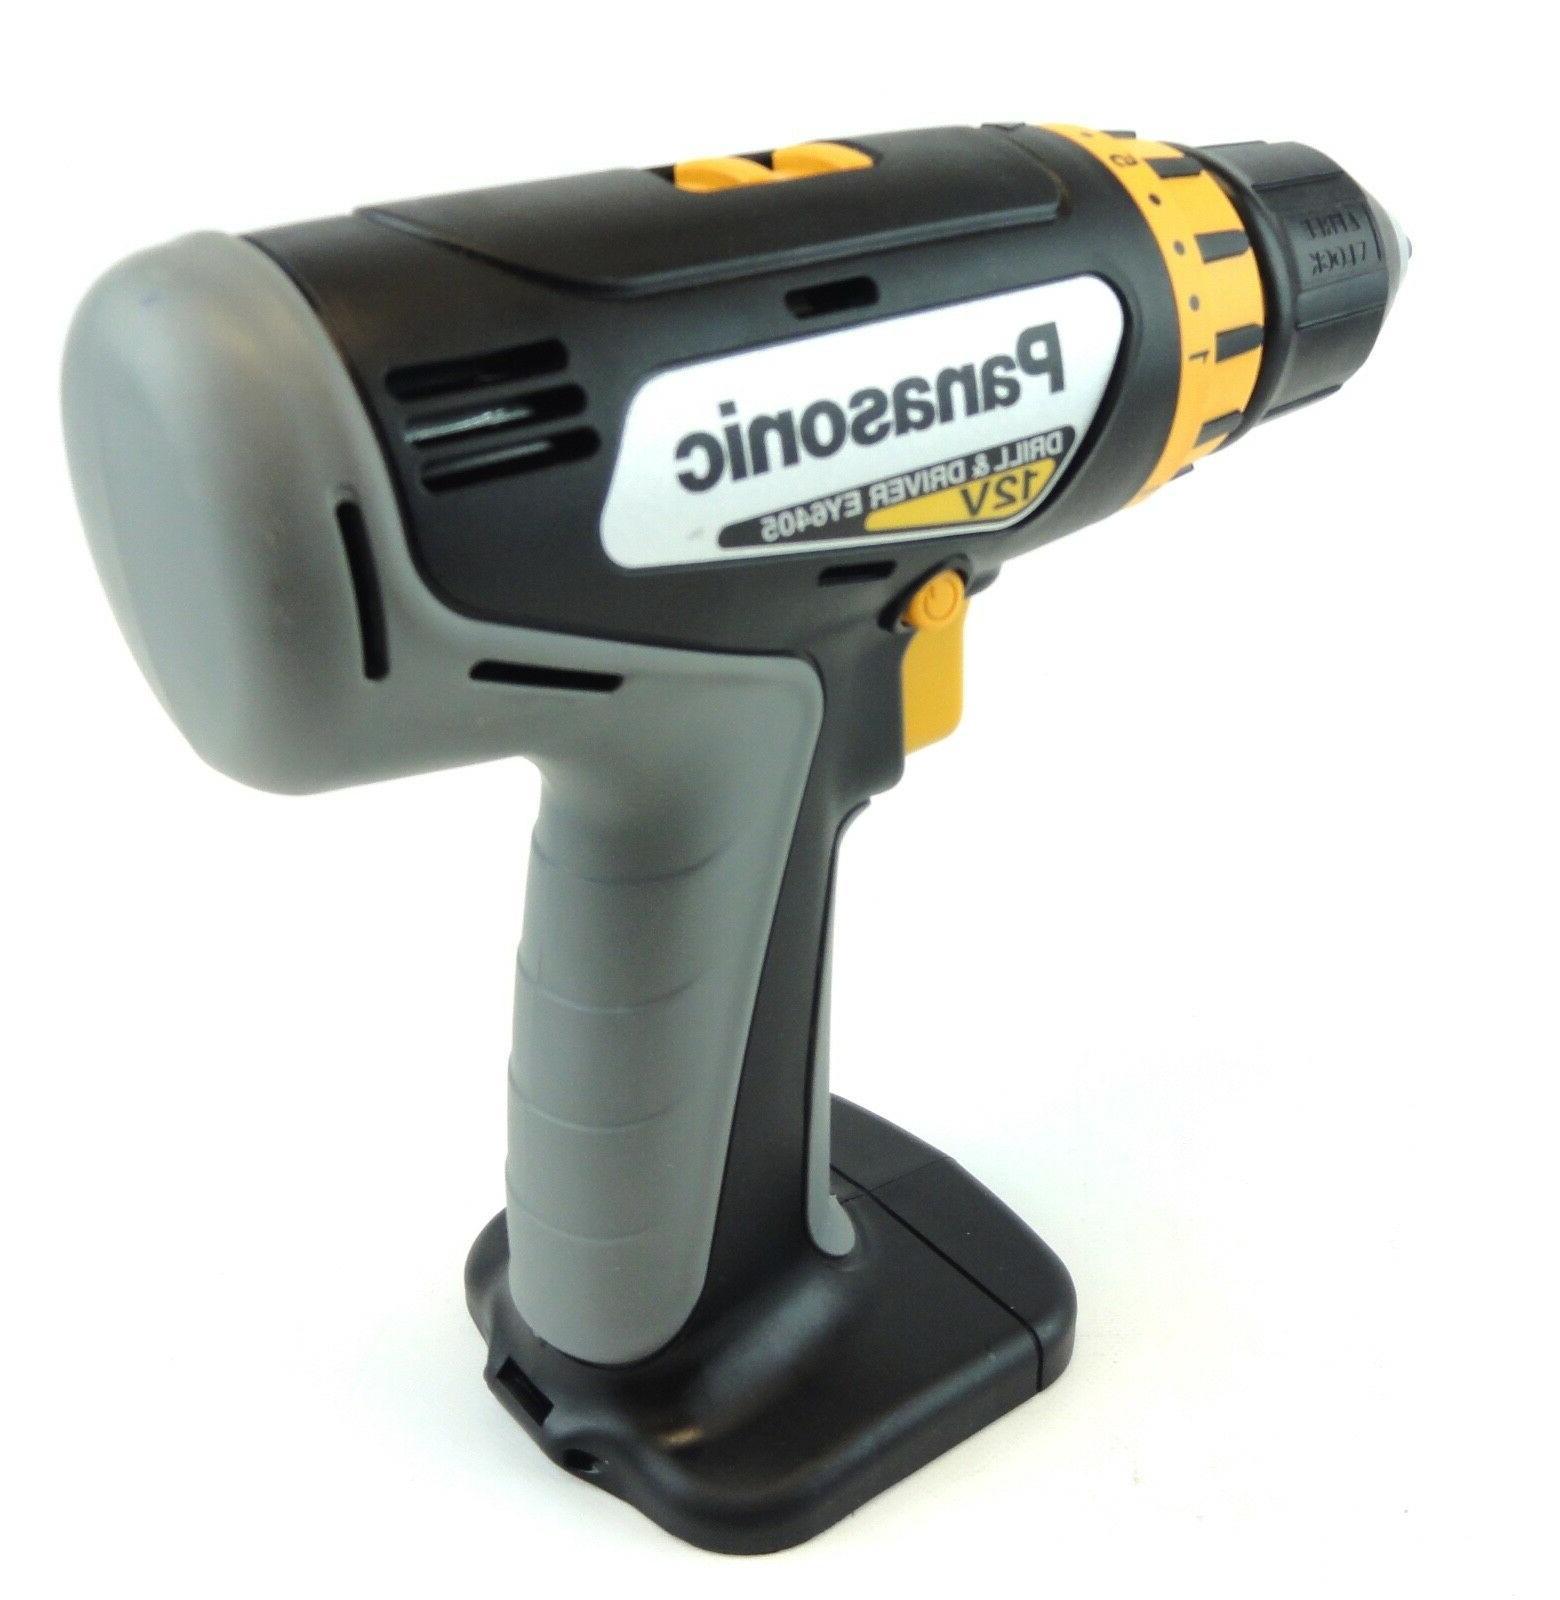 Panasonic New Genuine EY6405 12V Drill